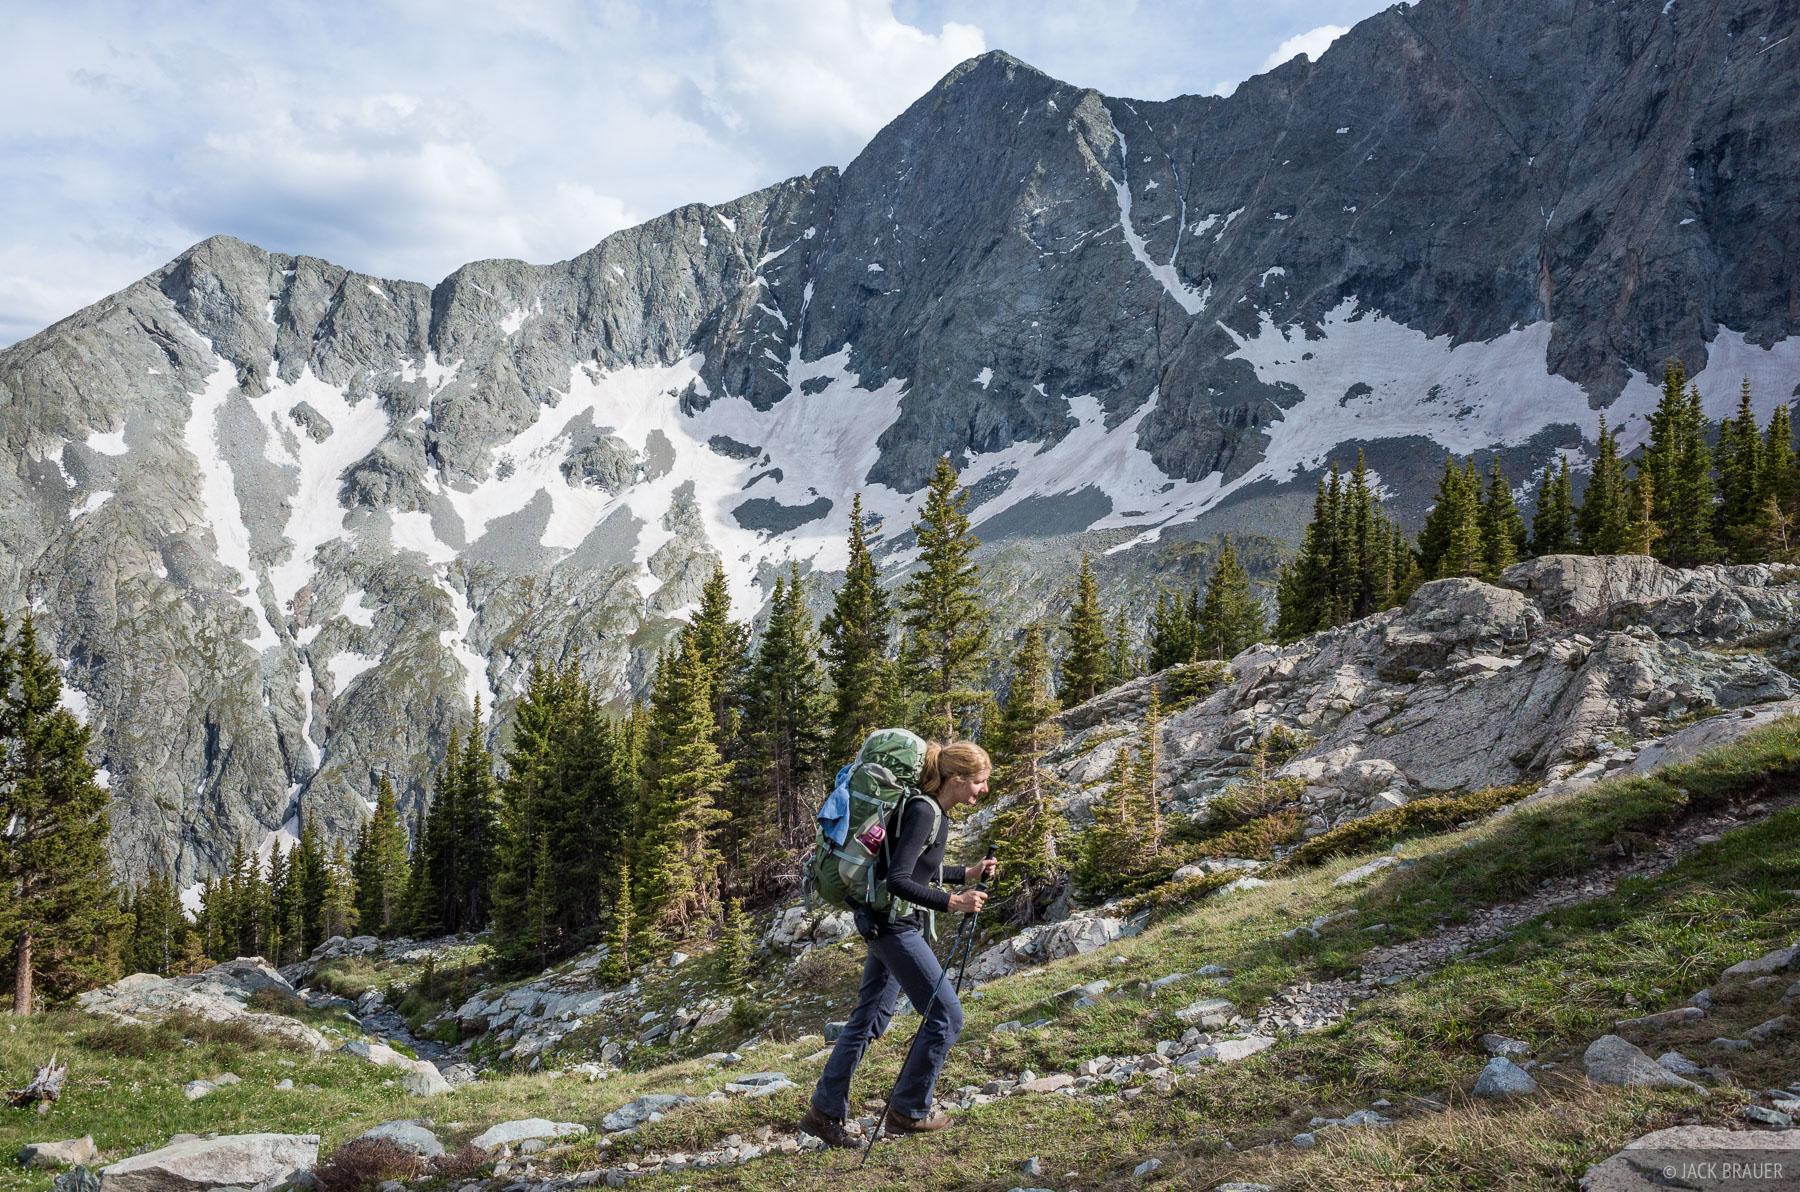 Blanca Peak, Colorado, Sangre de Cristos, hiking, Lily Lake, photo